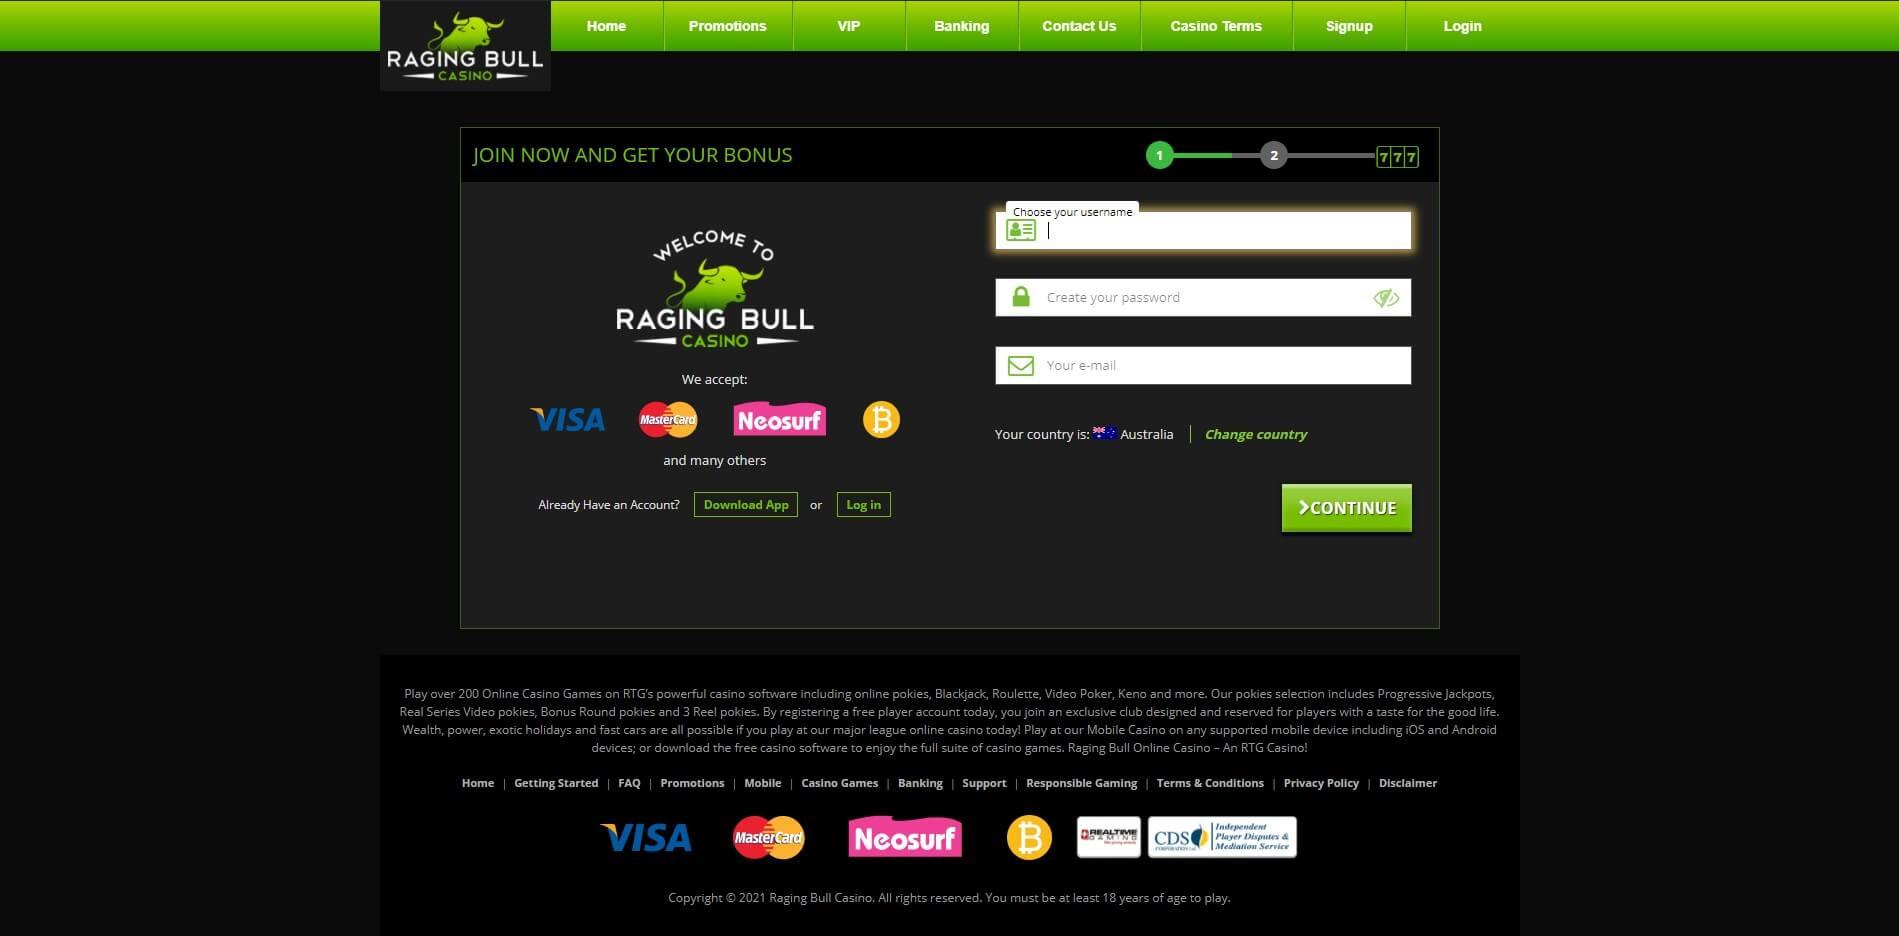 Raging Bull Casino Sing Up Screenshot